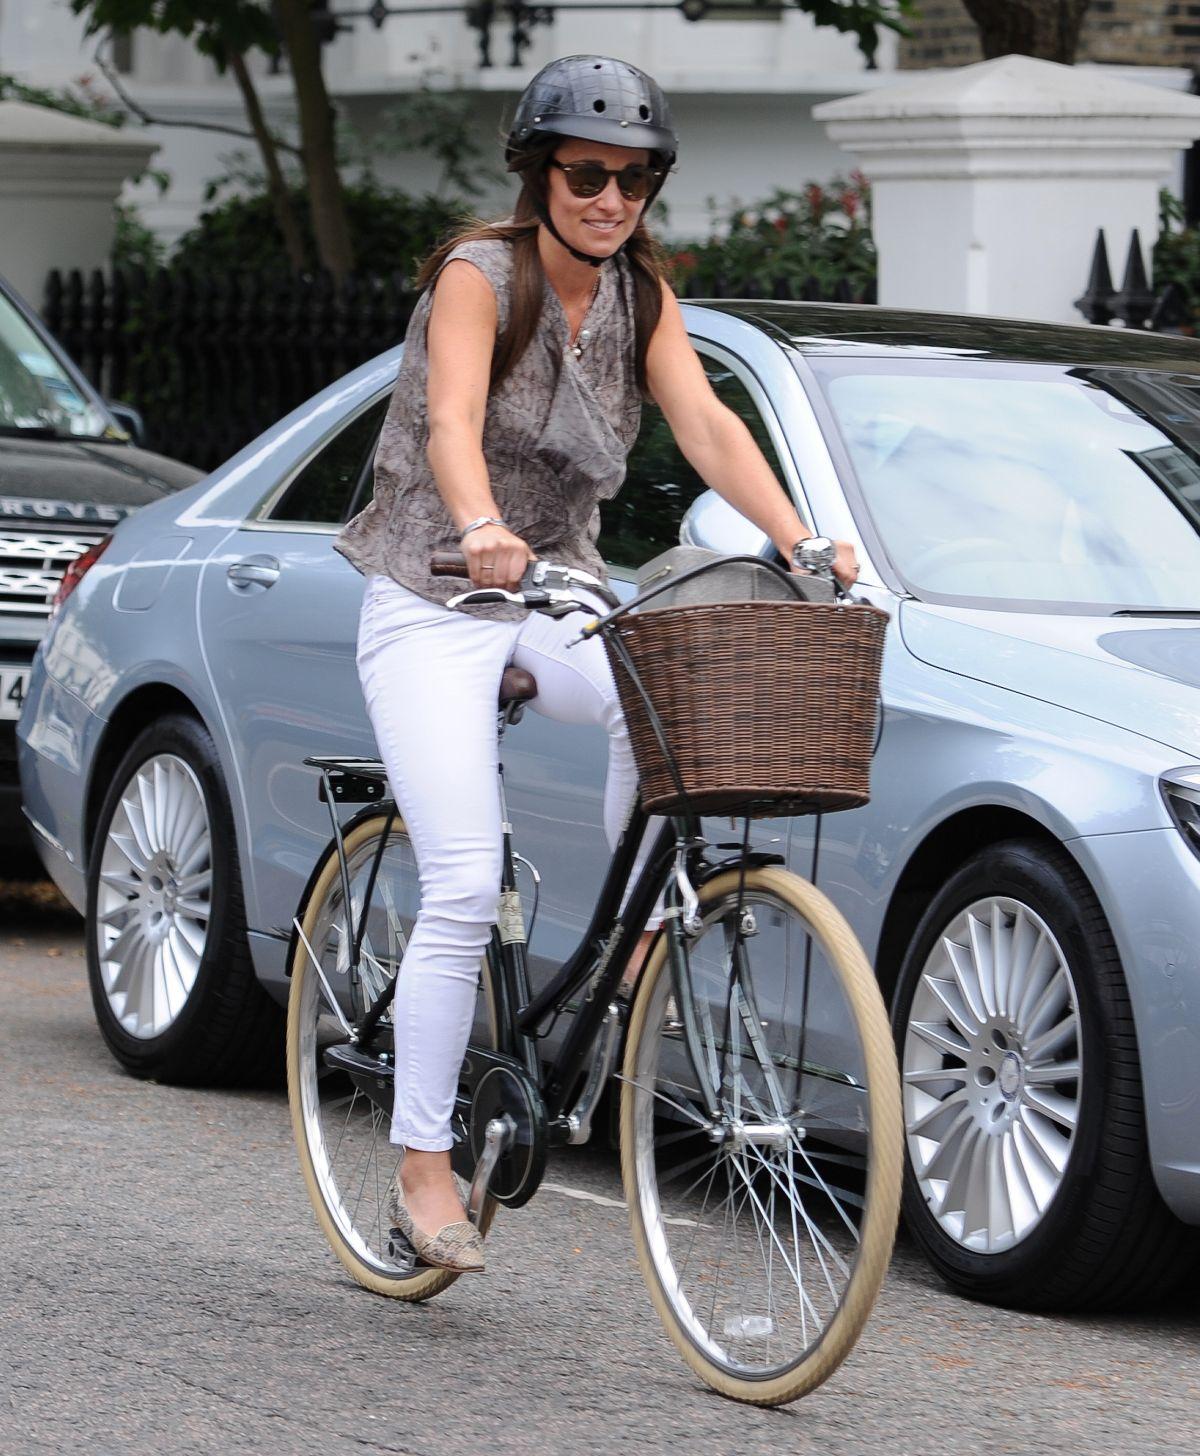 PIPPA MIDDLETON Riding a Bike Out in London 07/26/2016